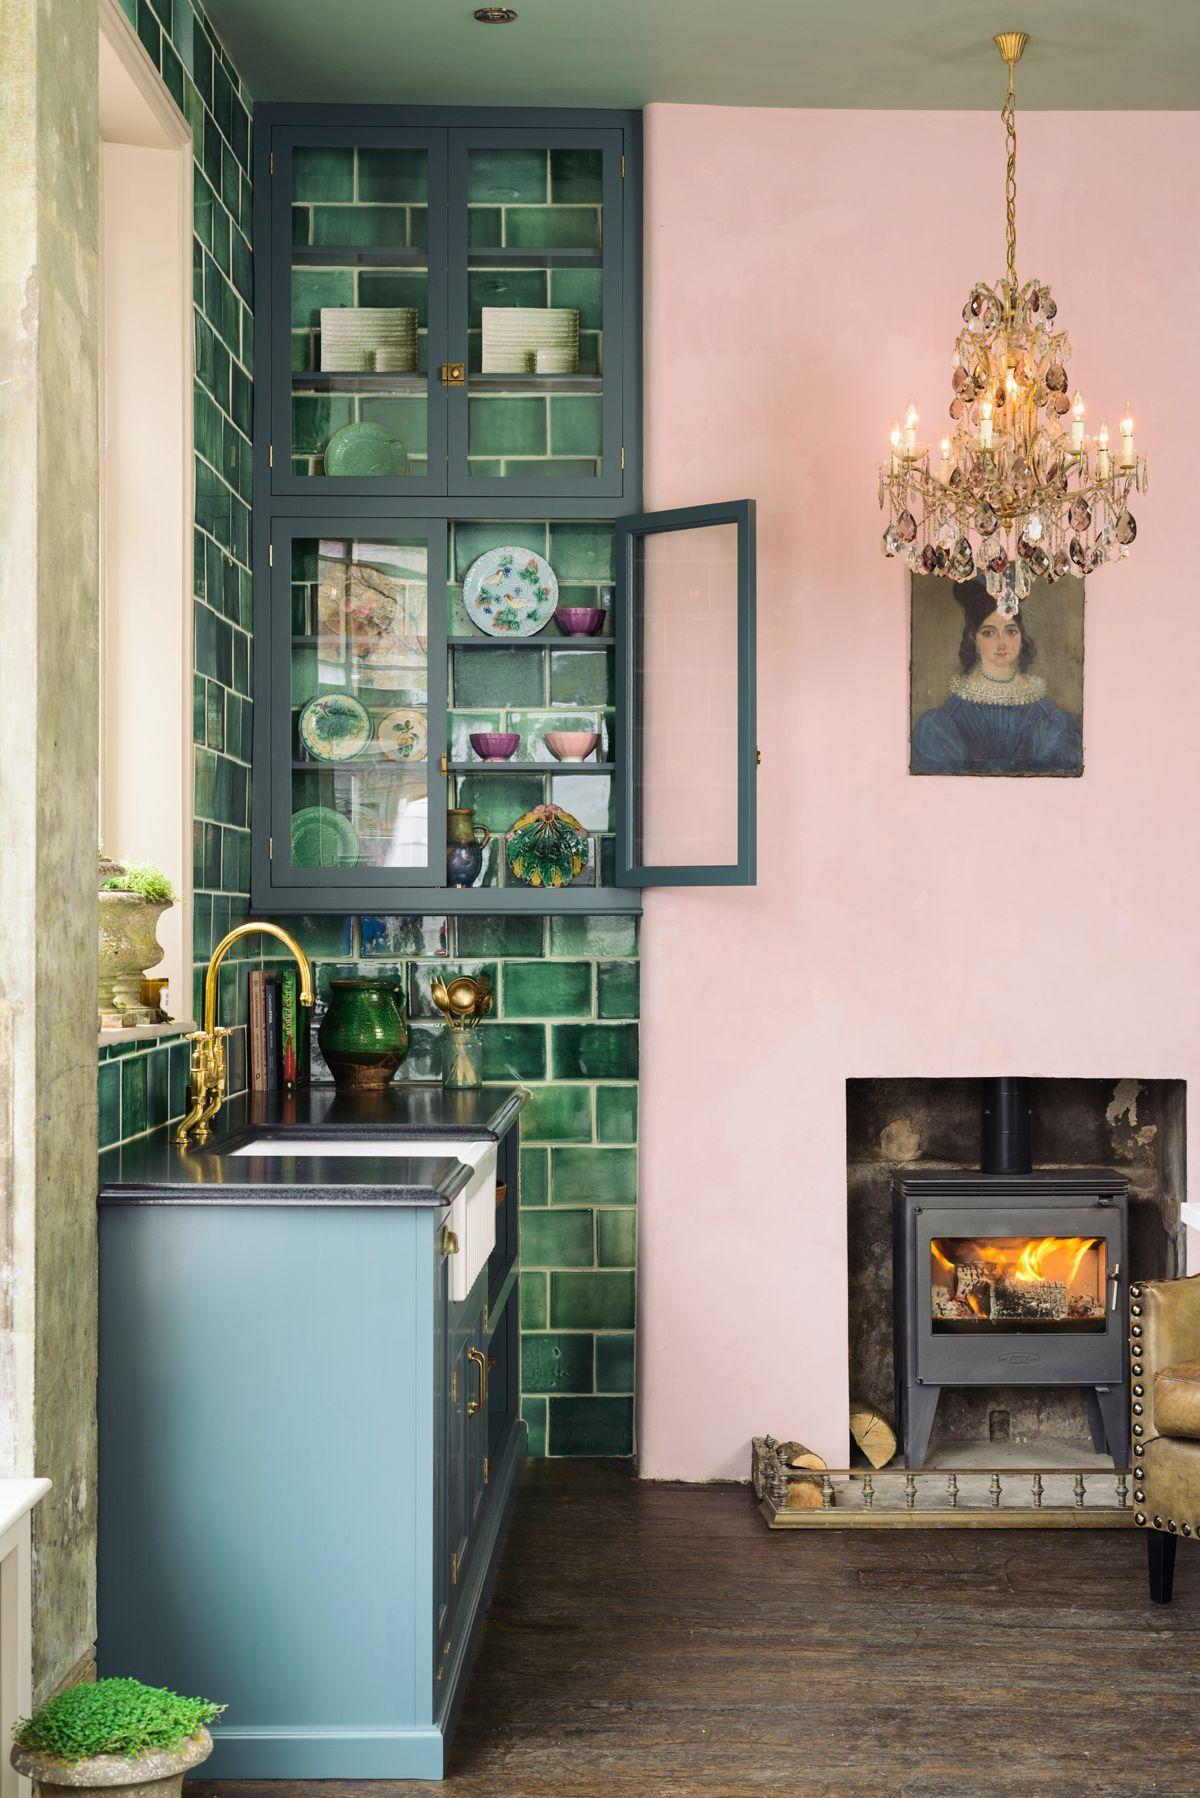 A Pink Green Kitchen Honestly Wtf Interior Design Kitchen Kitchen Design Small Retro Home Decor